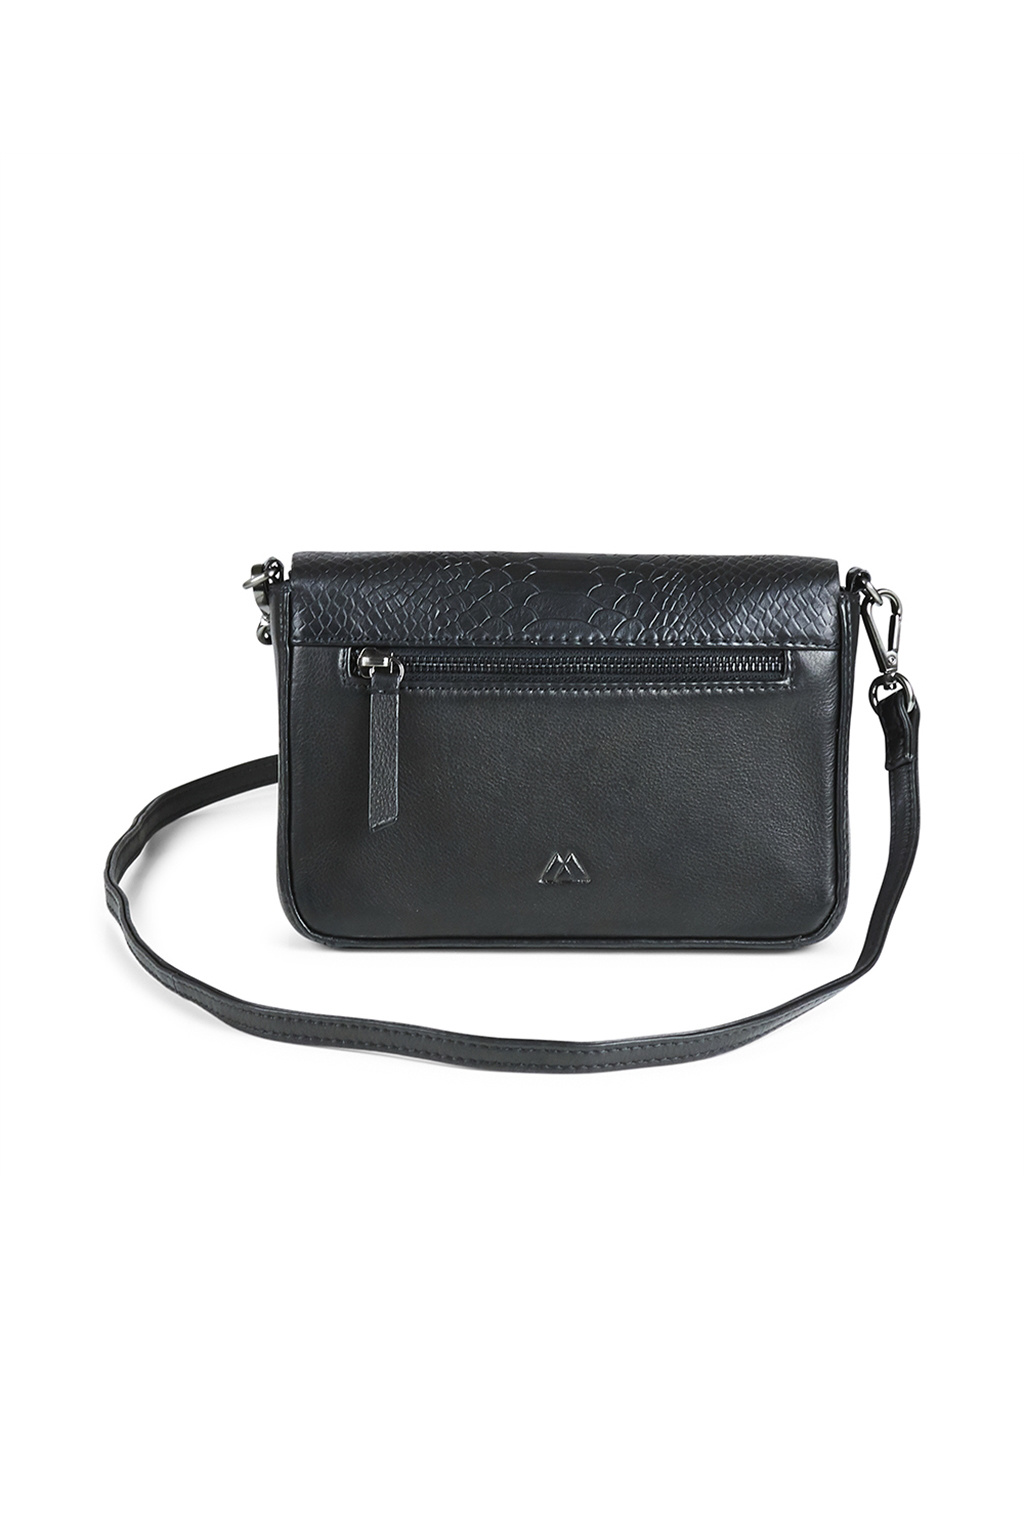 Vanya Crossbody Bag Snake - Black-4